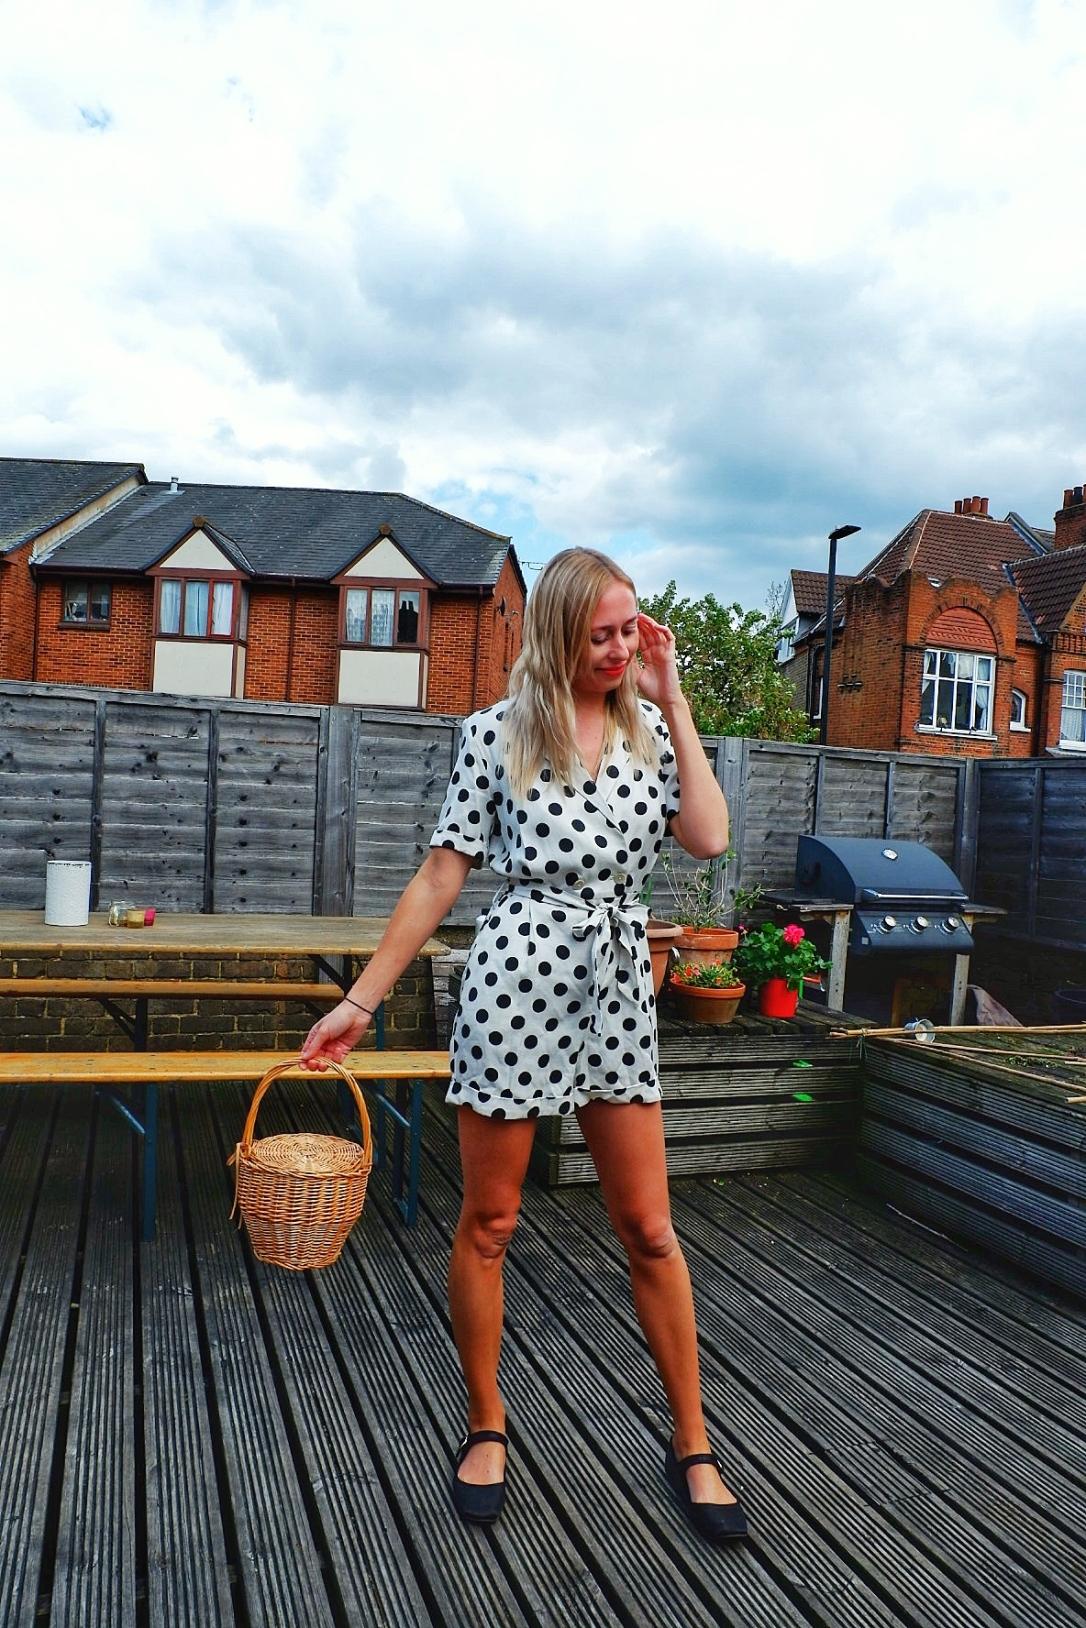 Topshop polka dot playsuit fashionista fashionblogger styleblogger